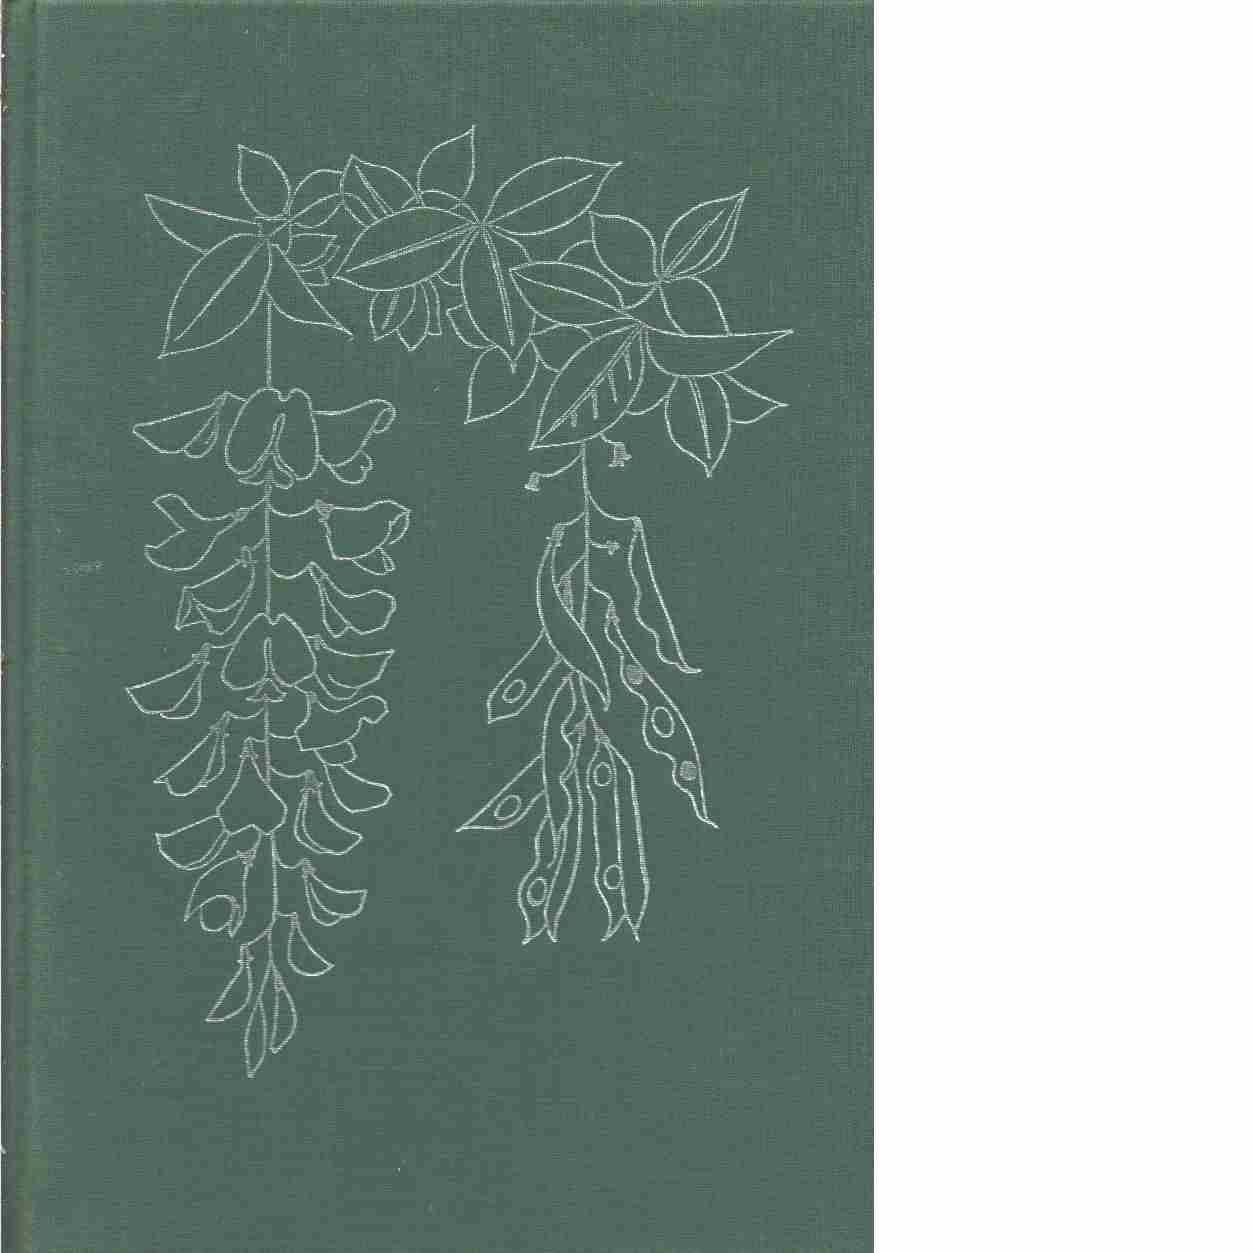 Giftiga växter i Sverige  - Fagerström, Rune